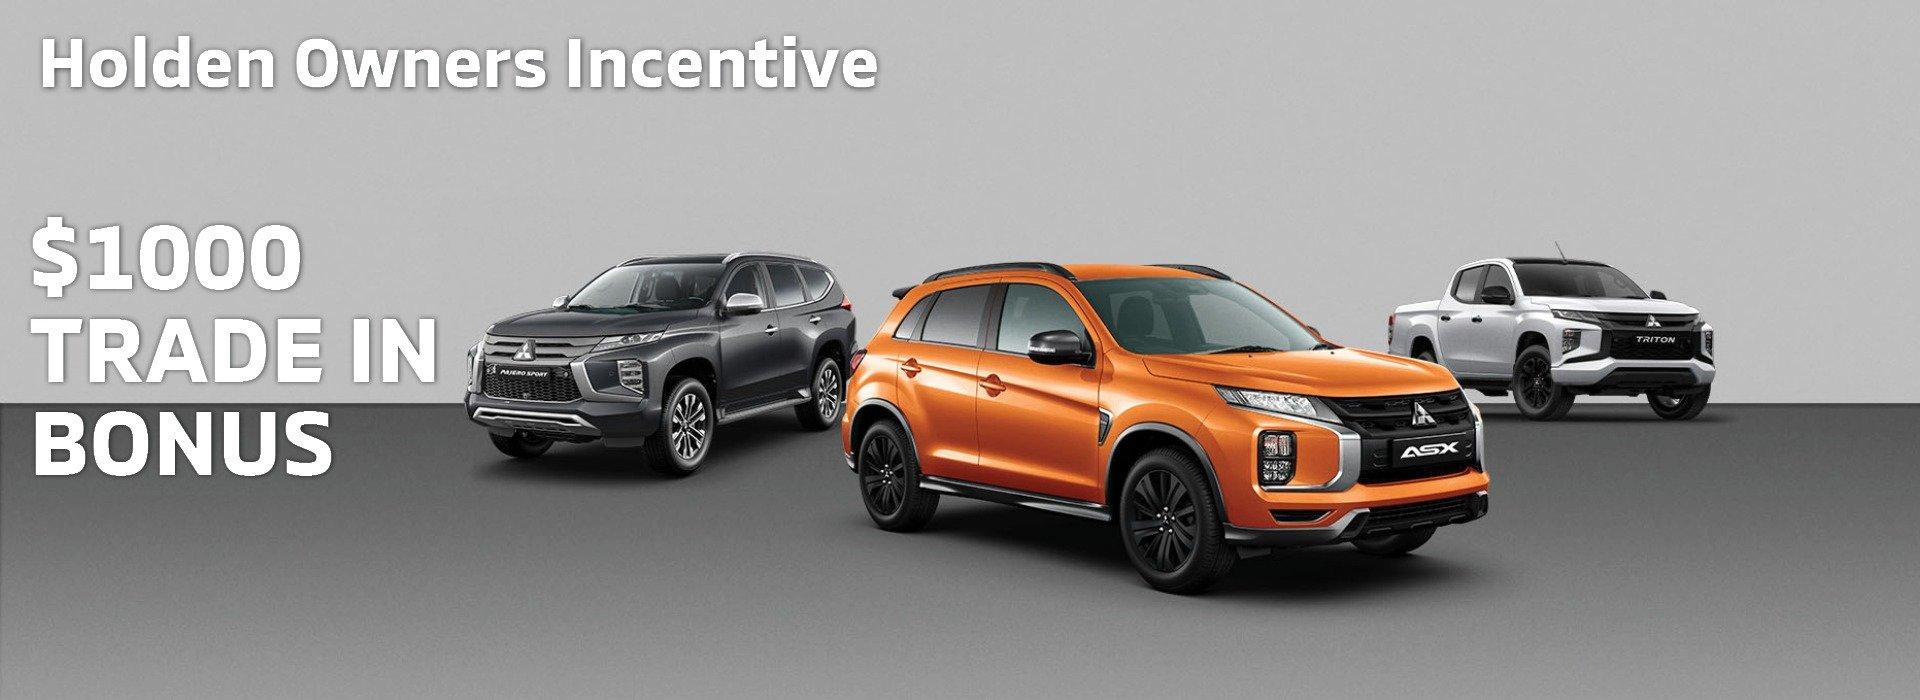 Holden $1000 Bonus incentive